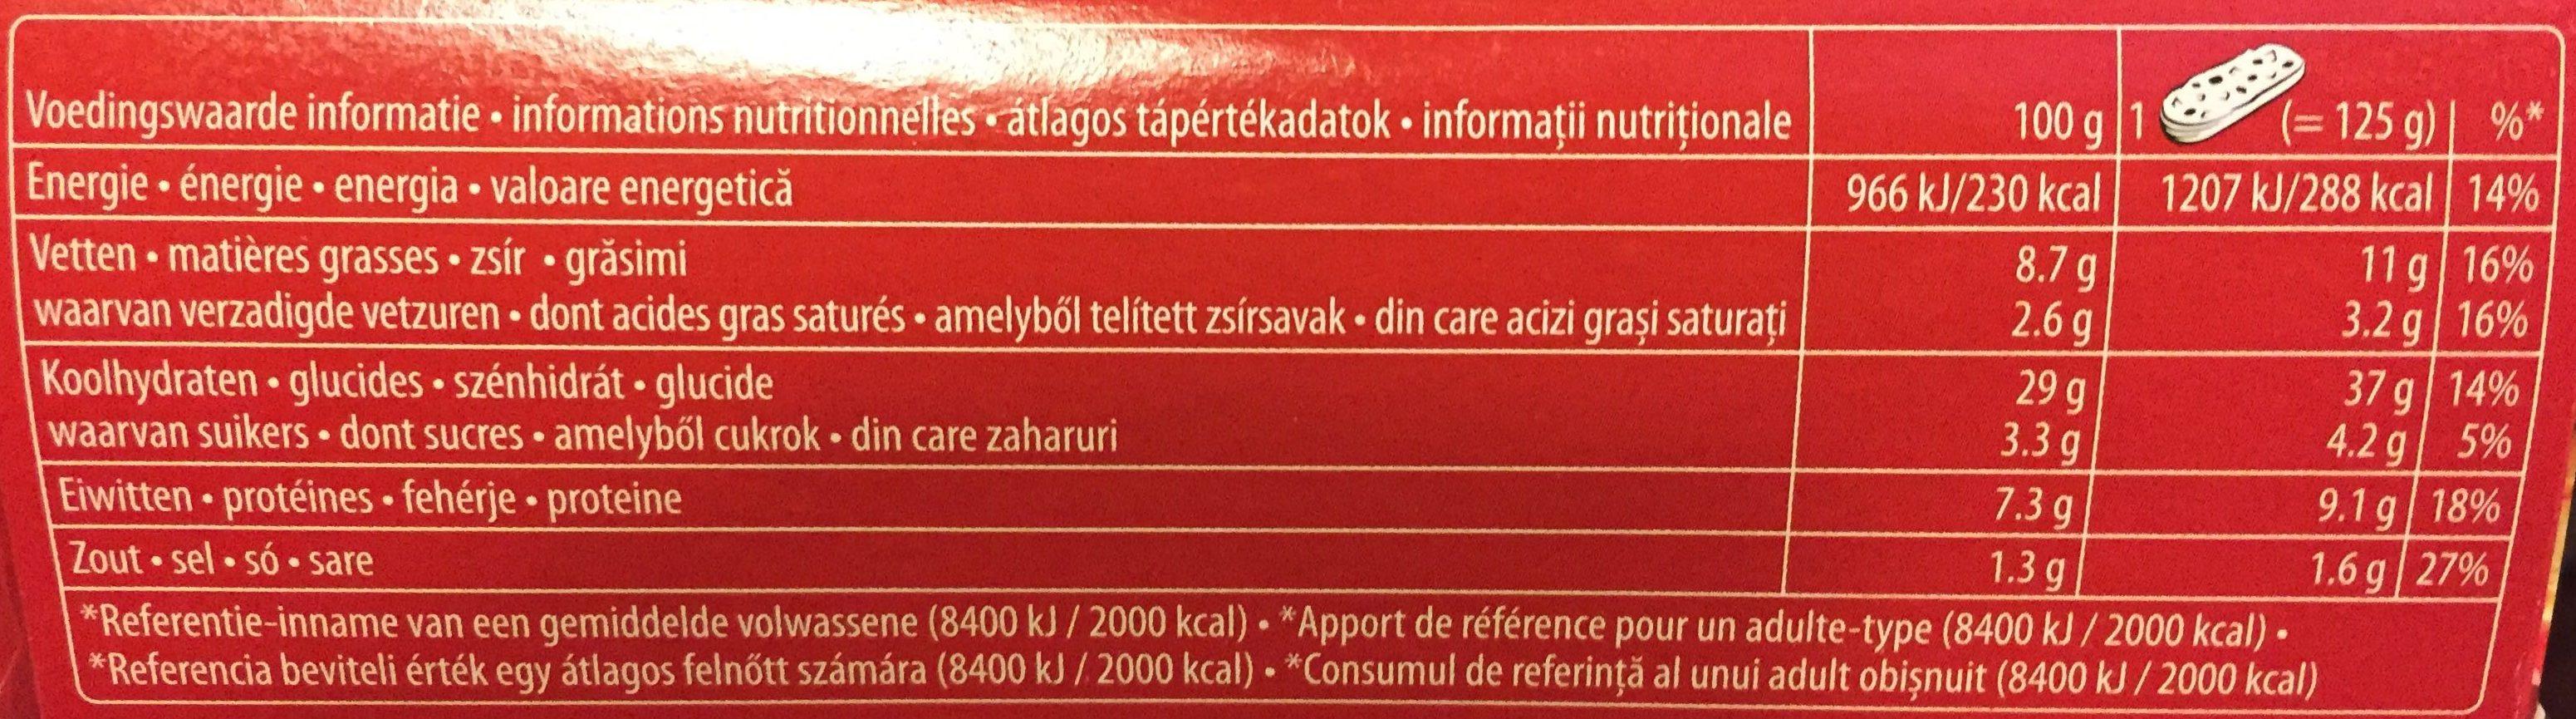 Bistro Classique Baguette Tomate & Fromage - Informations nutritionnelles